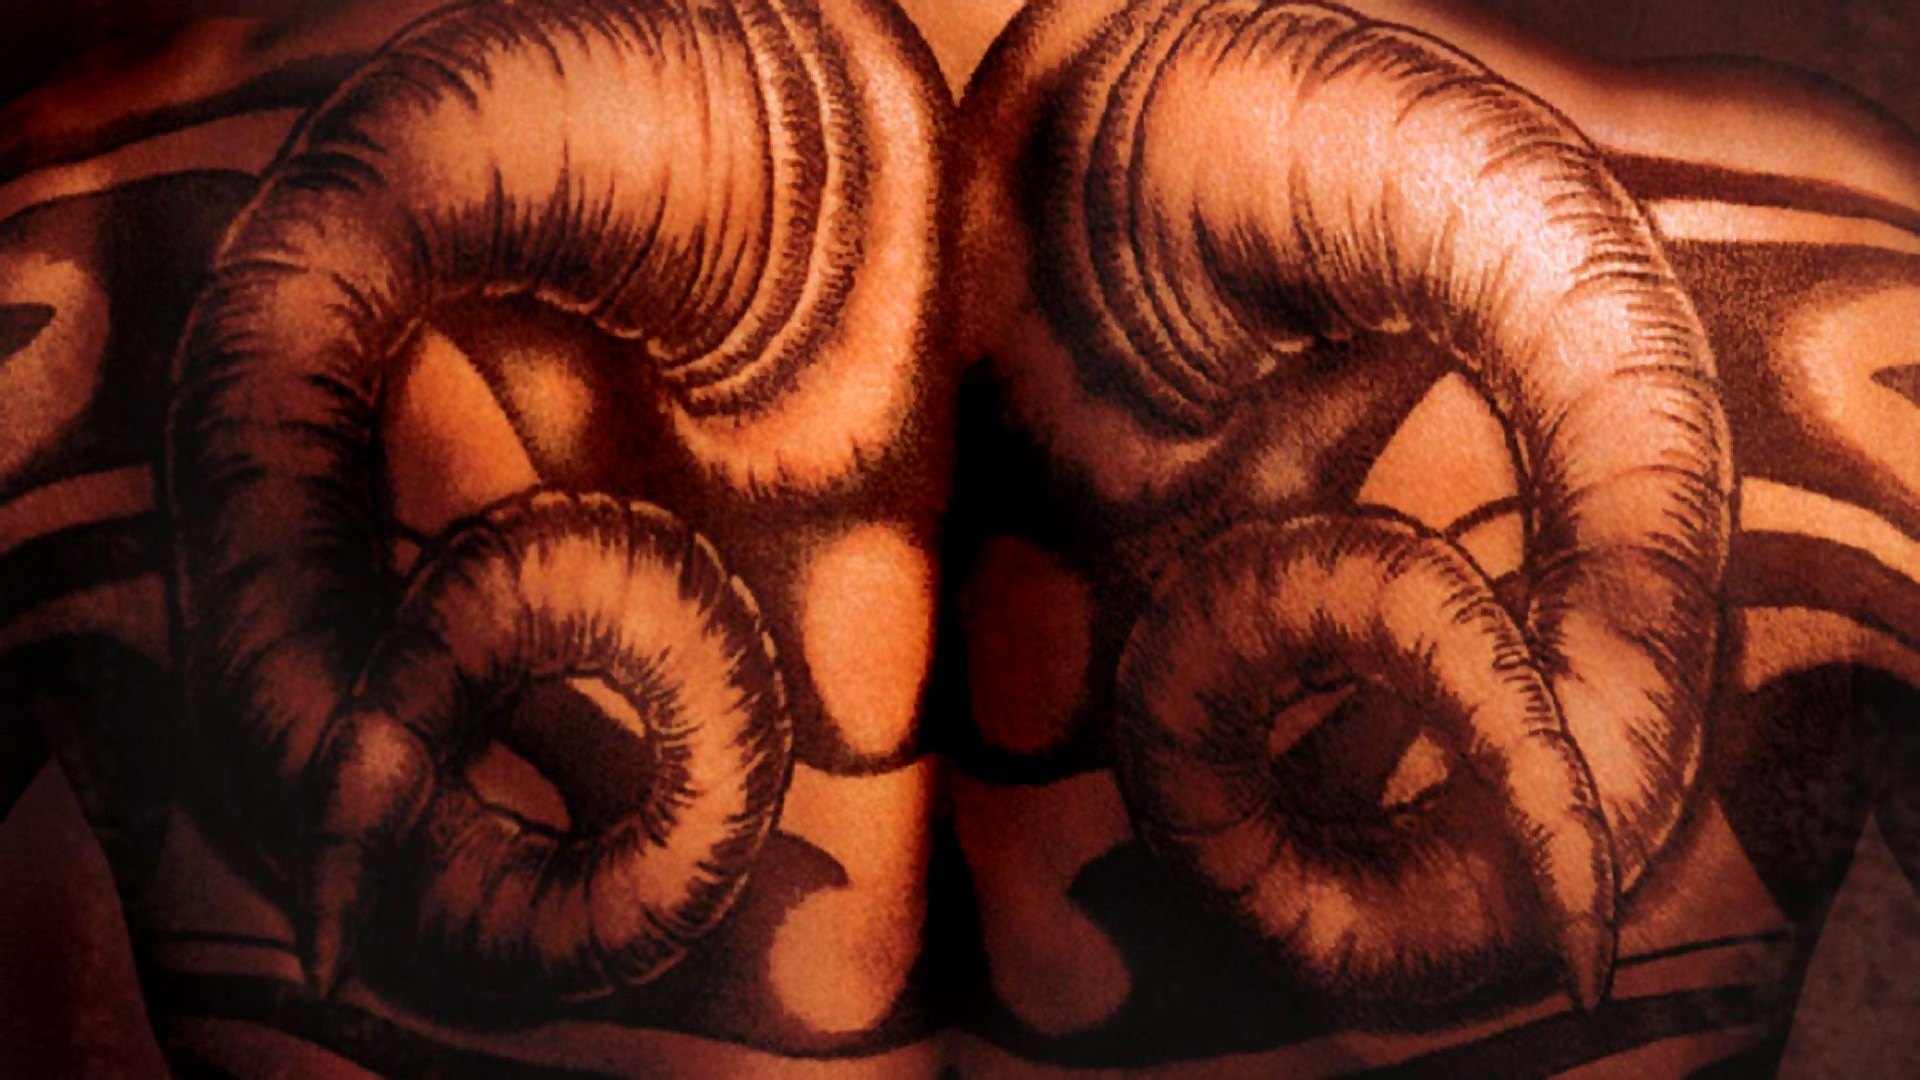 … Background Full HD 1080p. Wallpaper red dragon, back, tattoo,  dragon